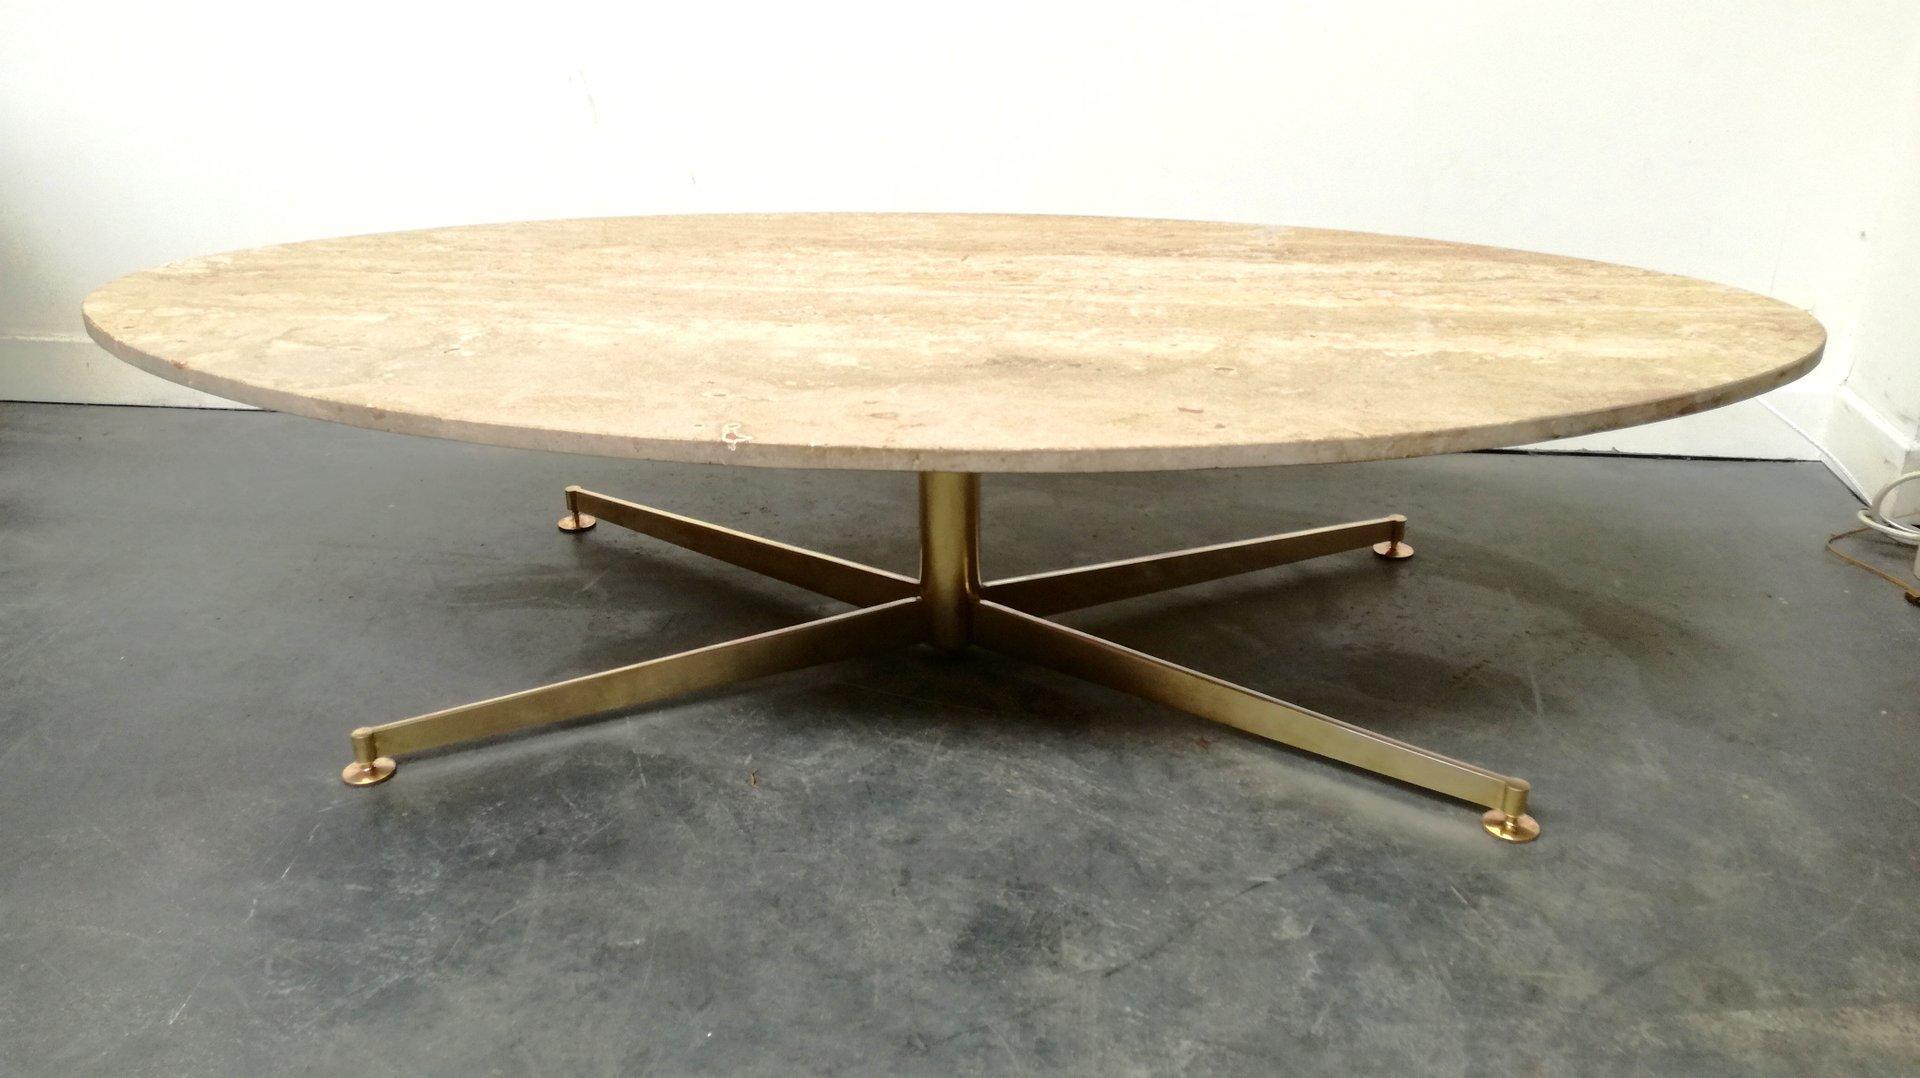 table basse en travertin marbre par michel kin pour. Black Bedroom Furniture Sets. Home Design Ideas